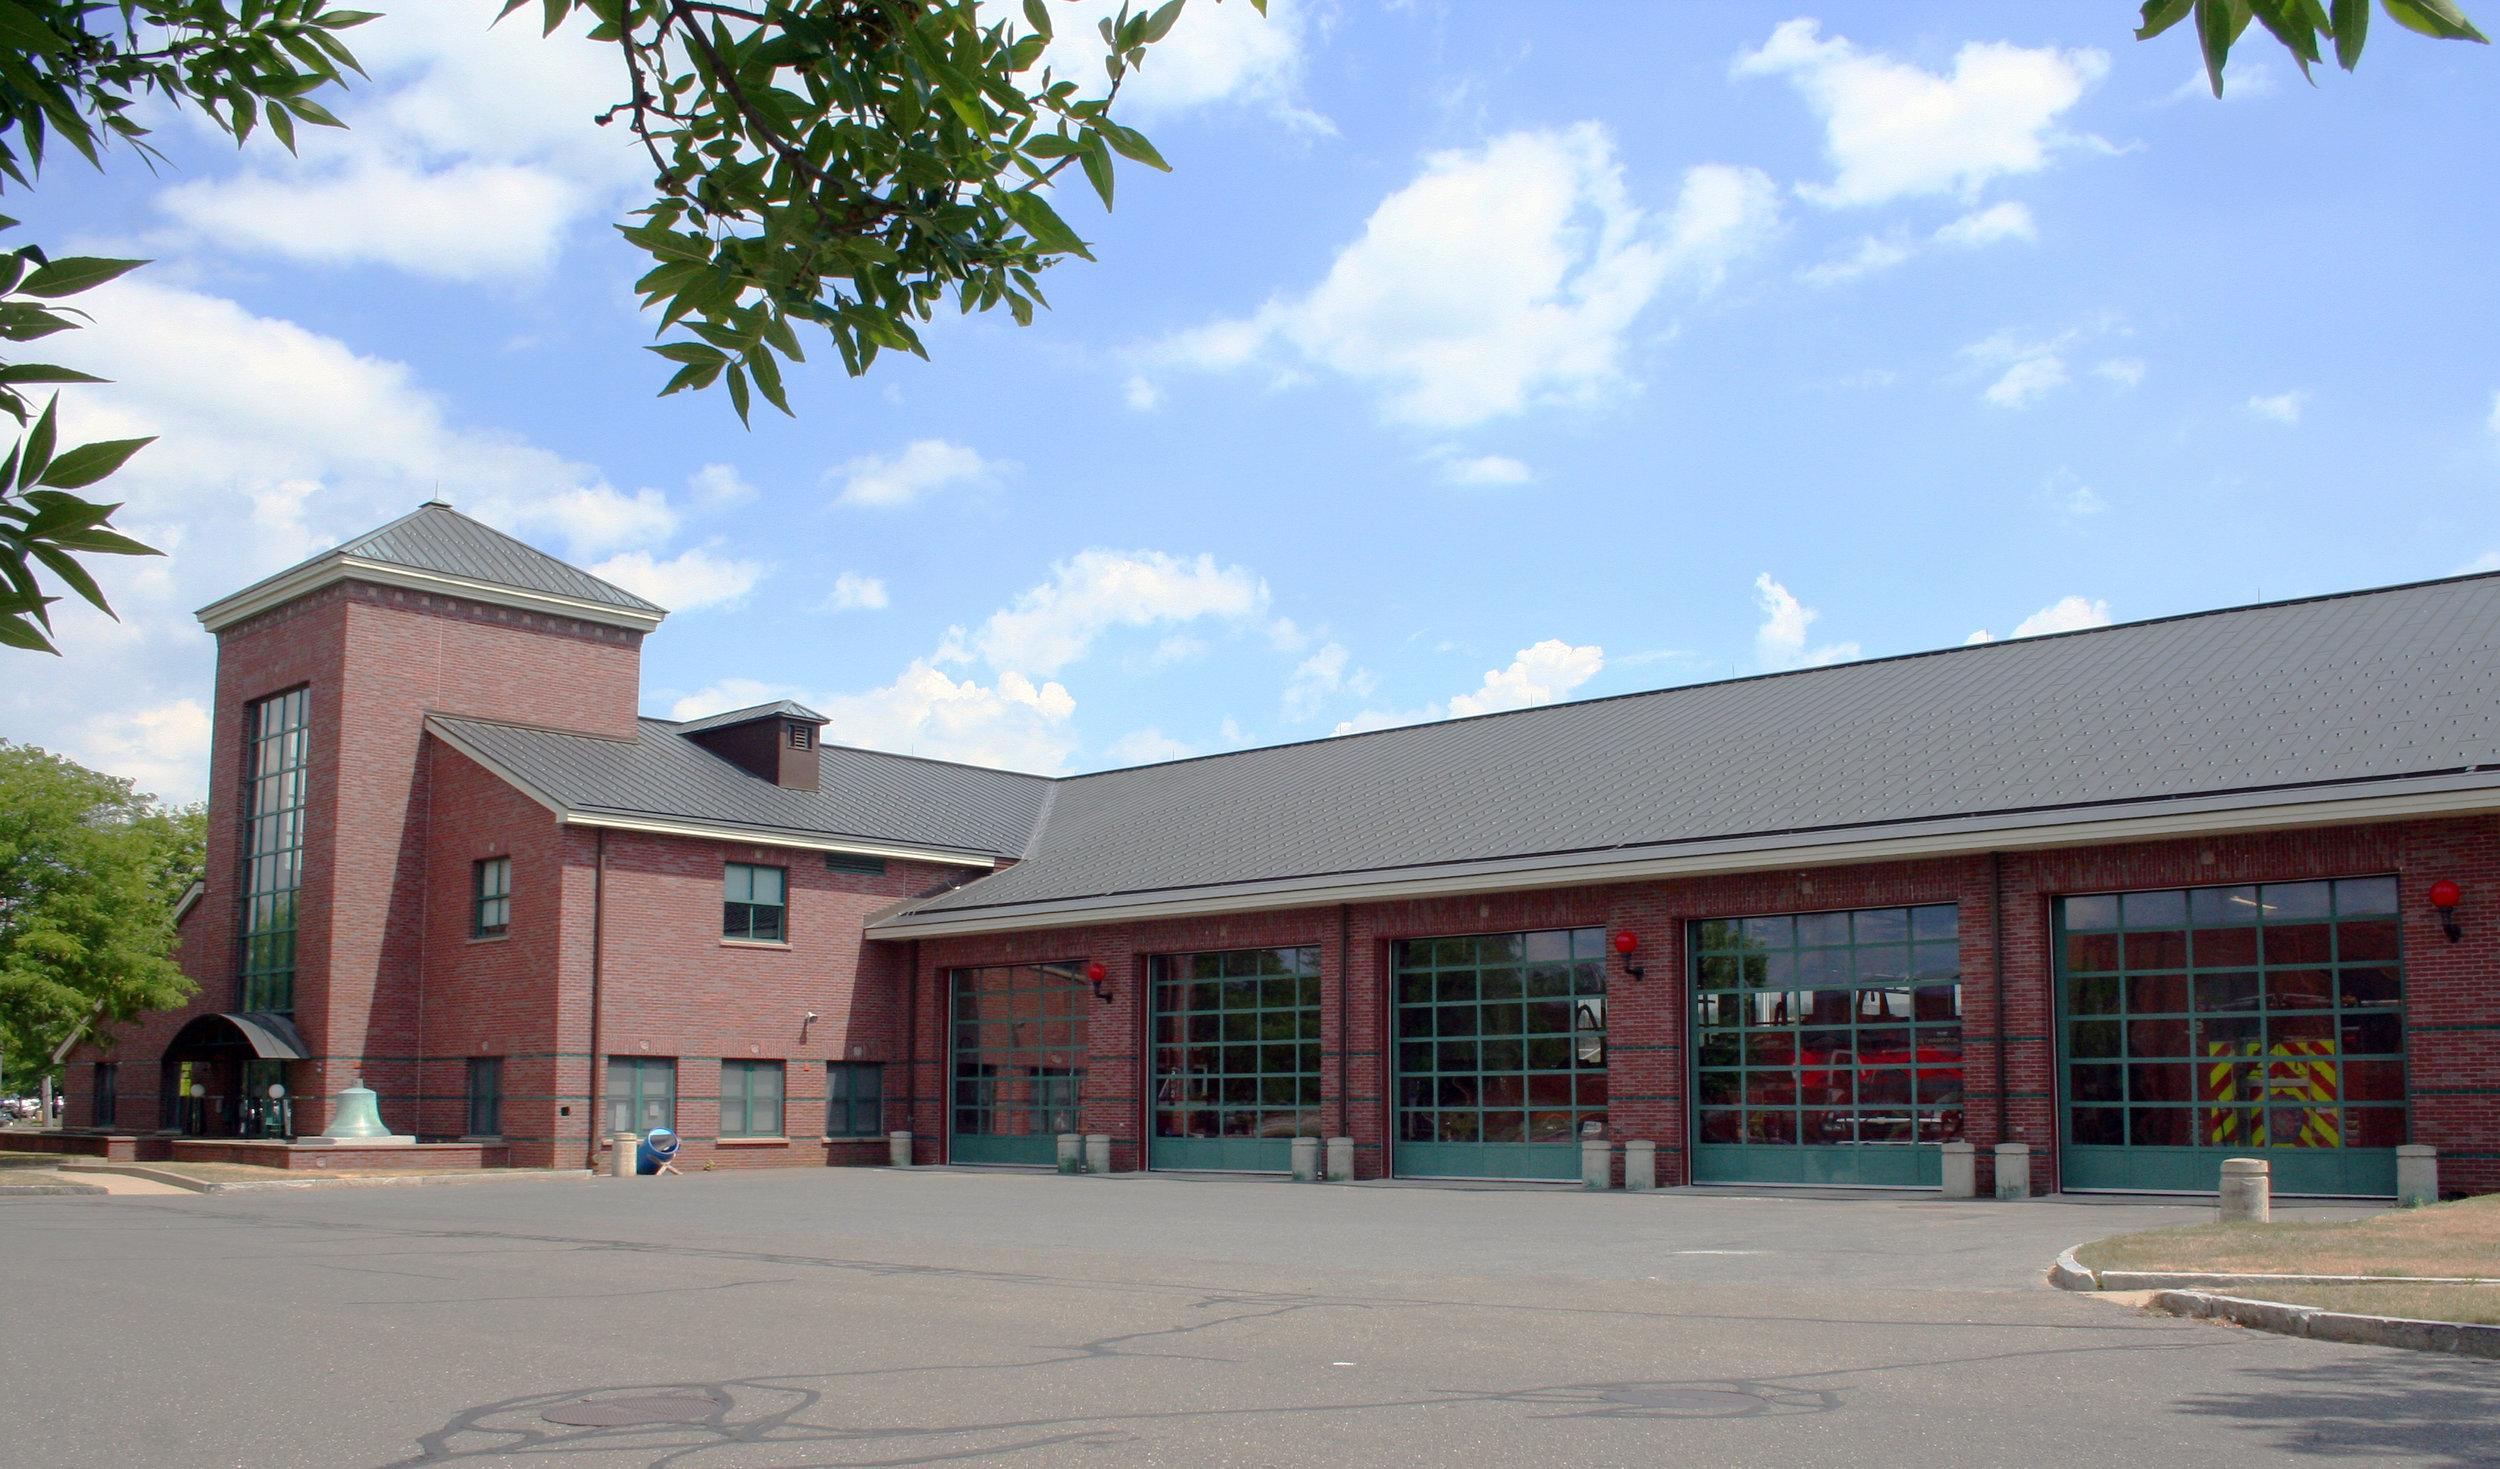 Northampton Fire Station